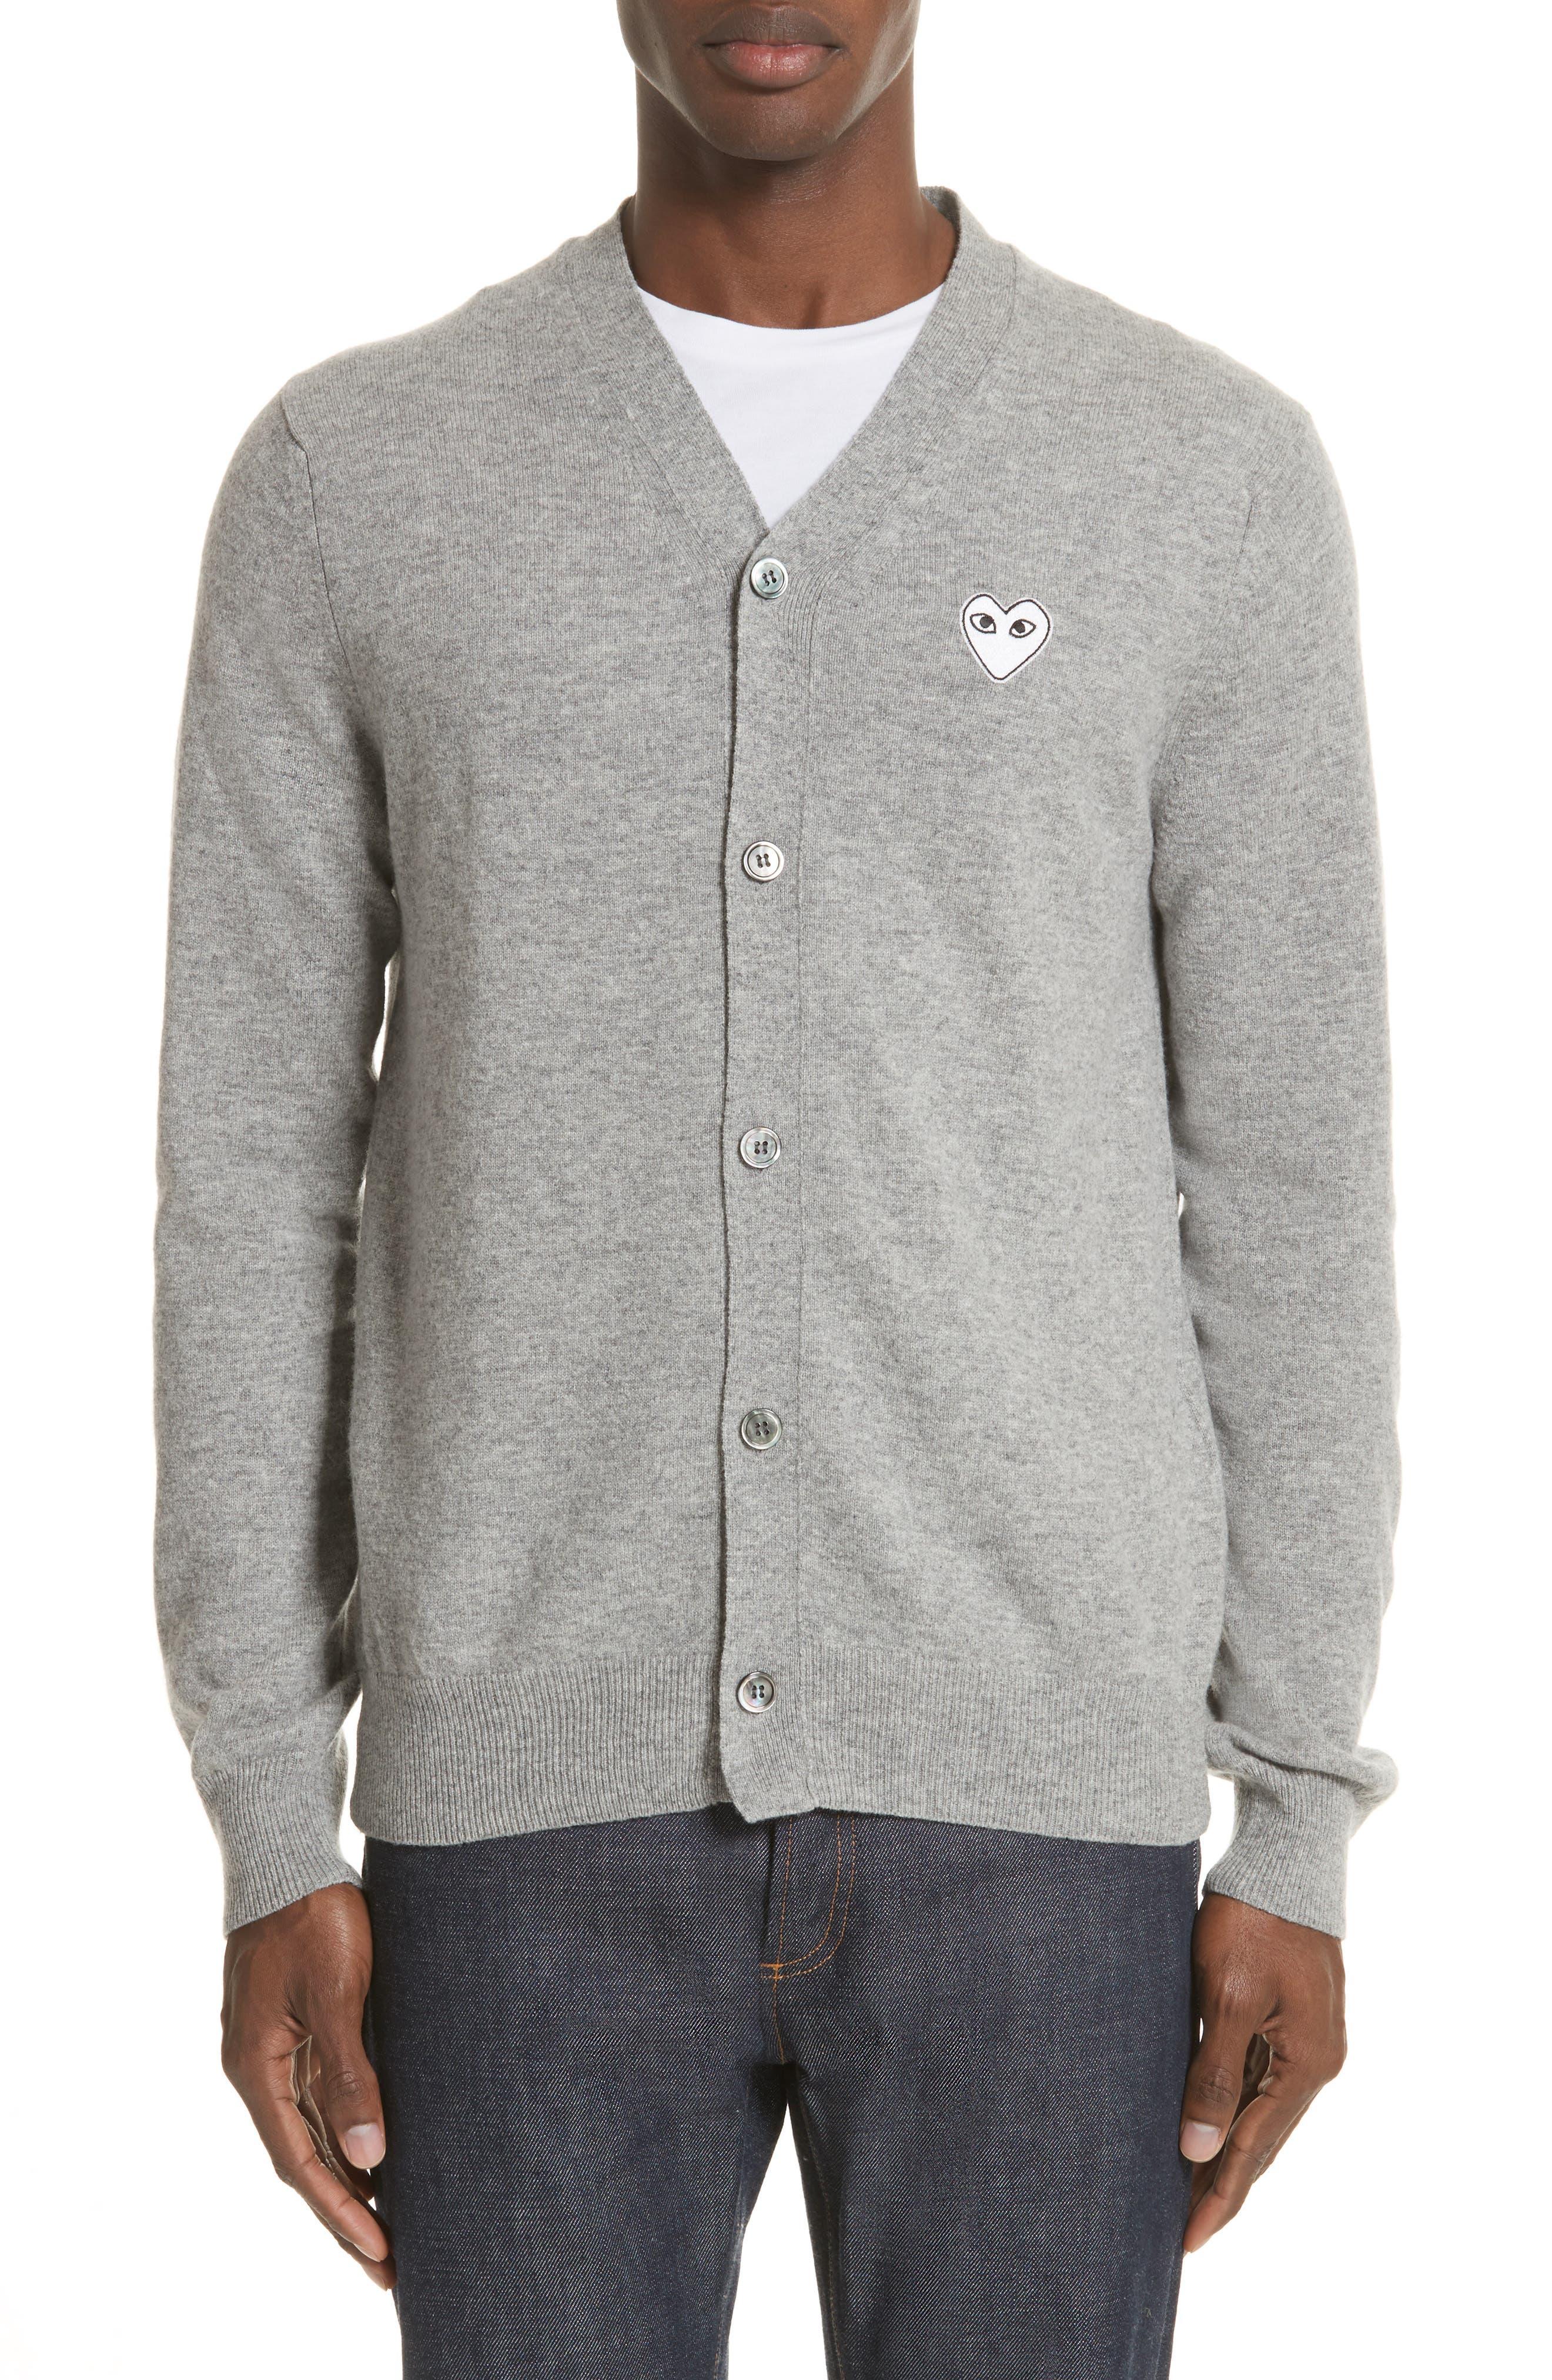 White Heart Wool Cardigan,                             Main thumbnail 1, color,                             Light Grey